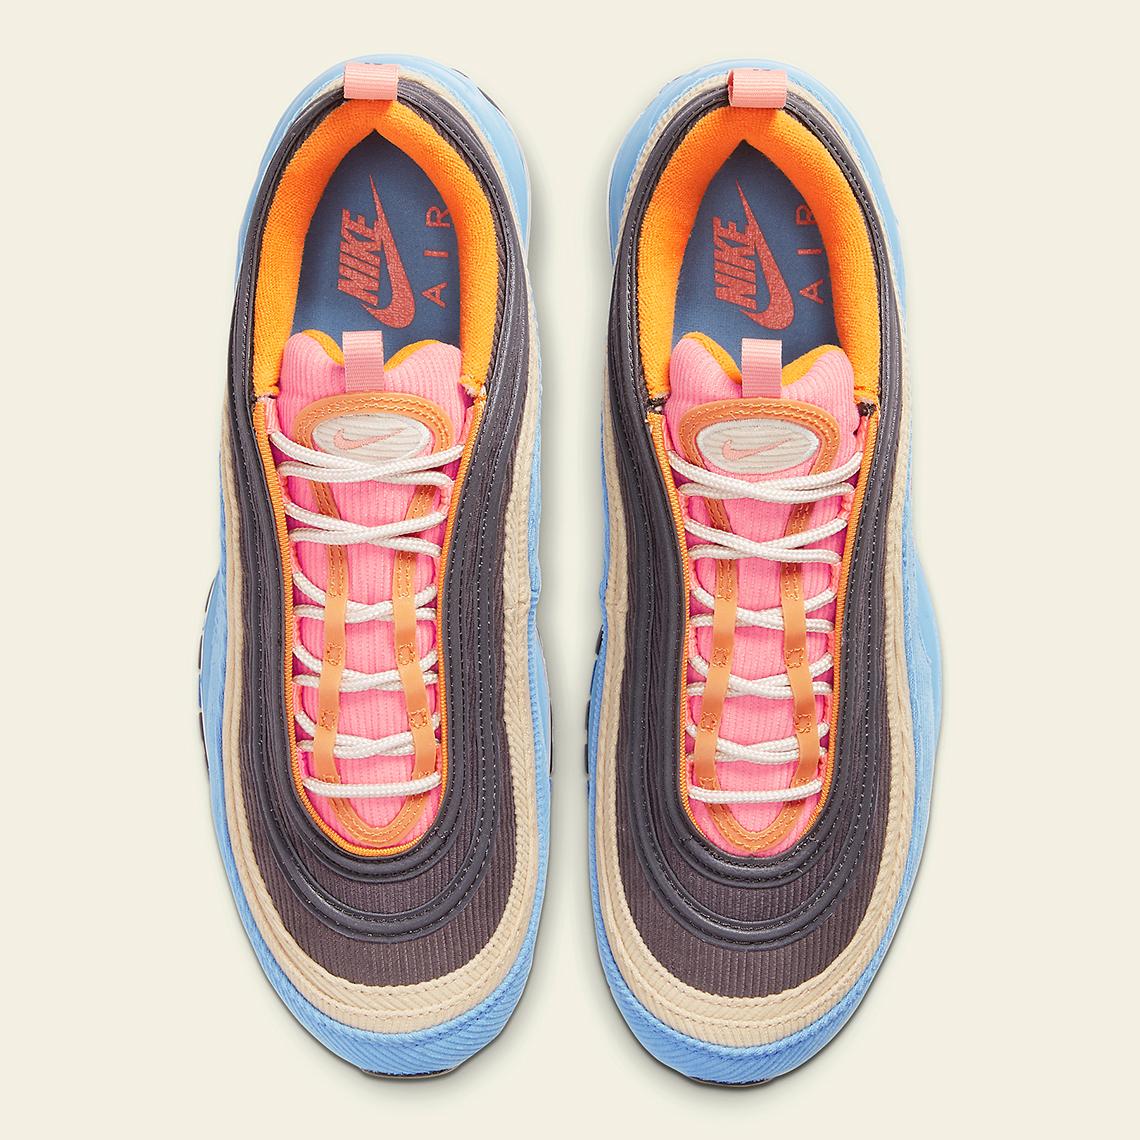 Nike Air Max 97 Corduroy Light Blue CQ7512 462 |